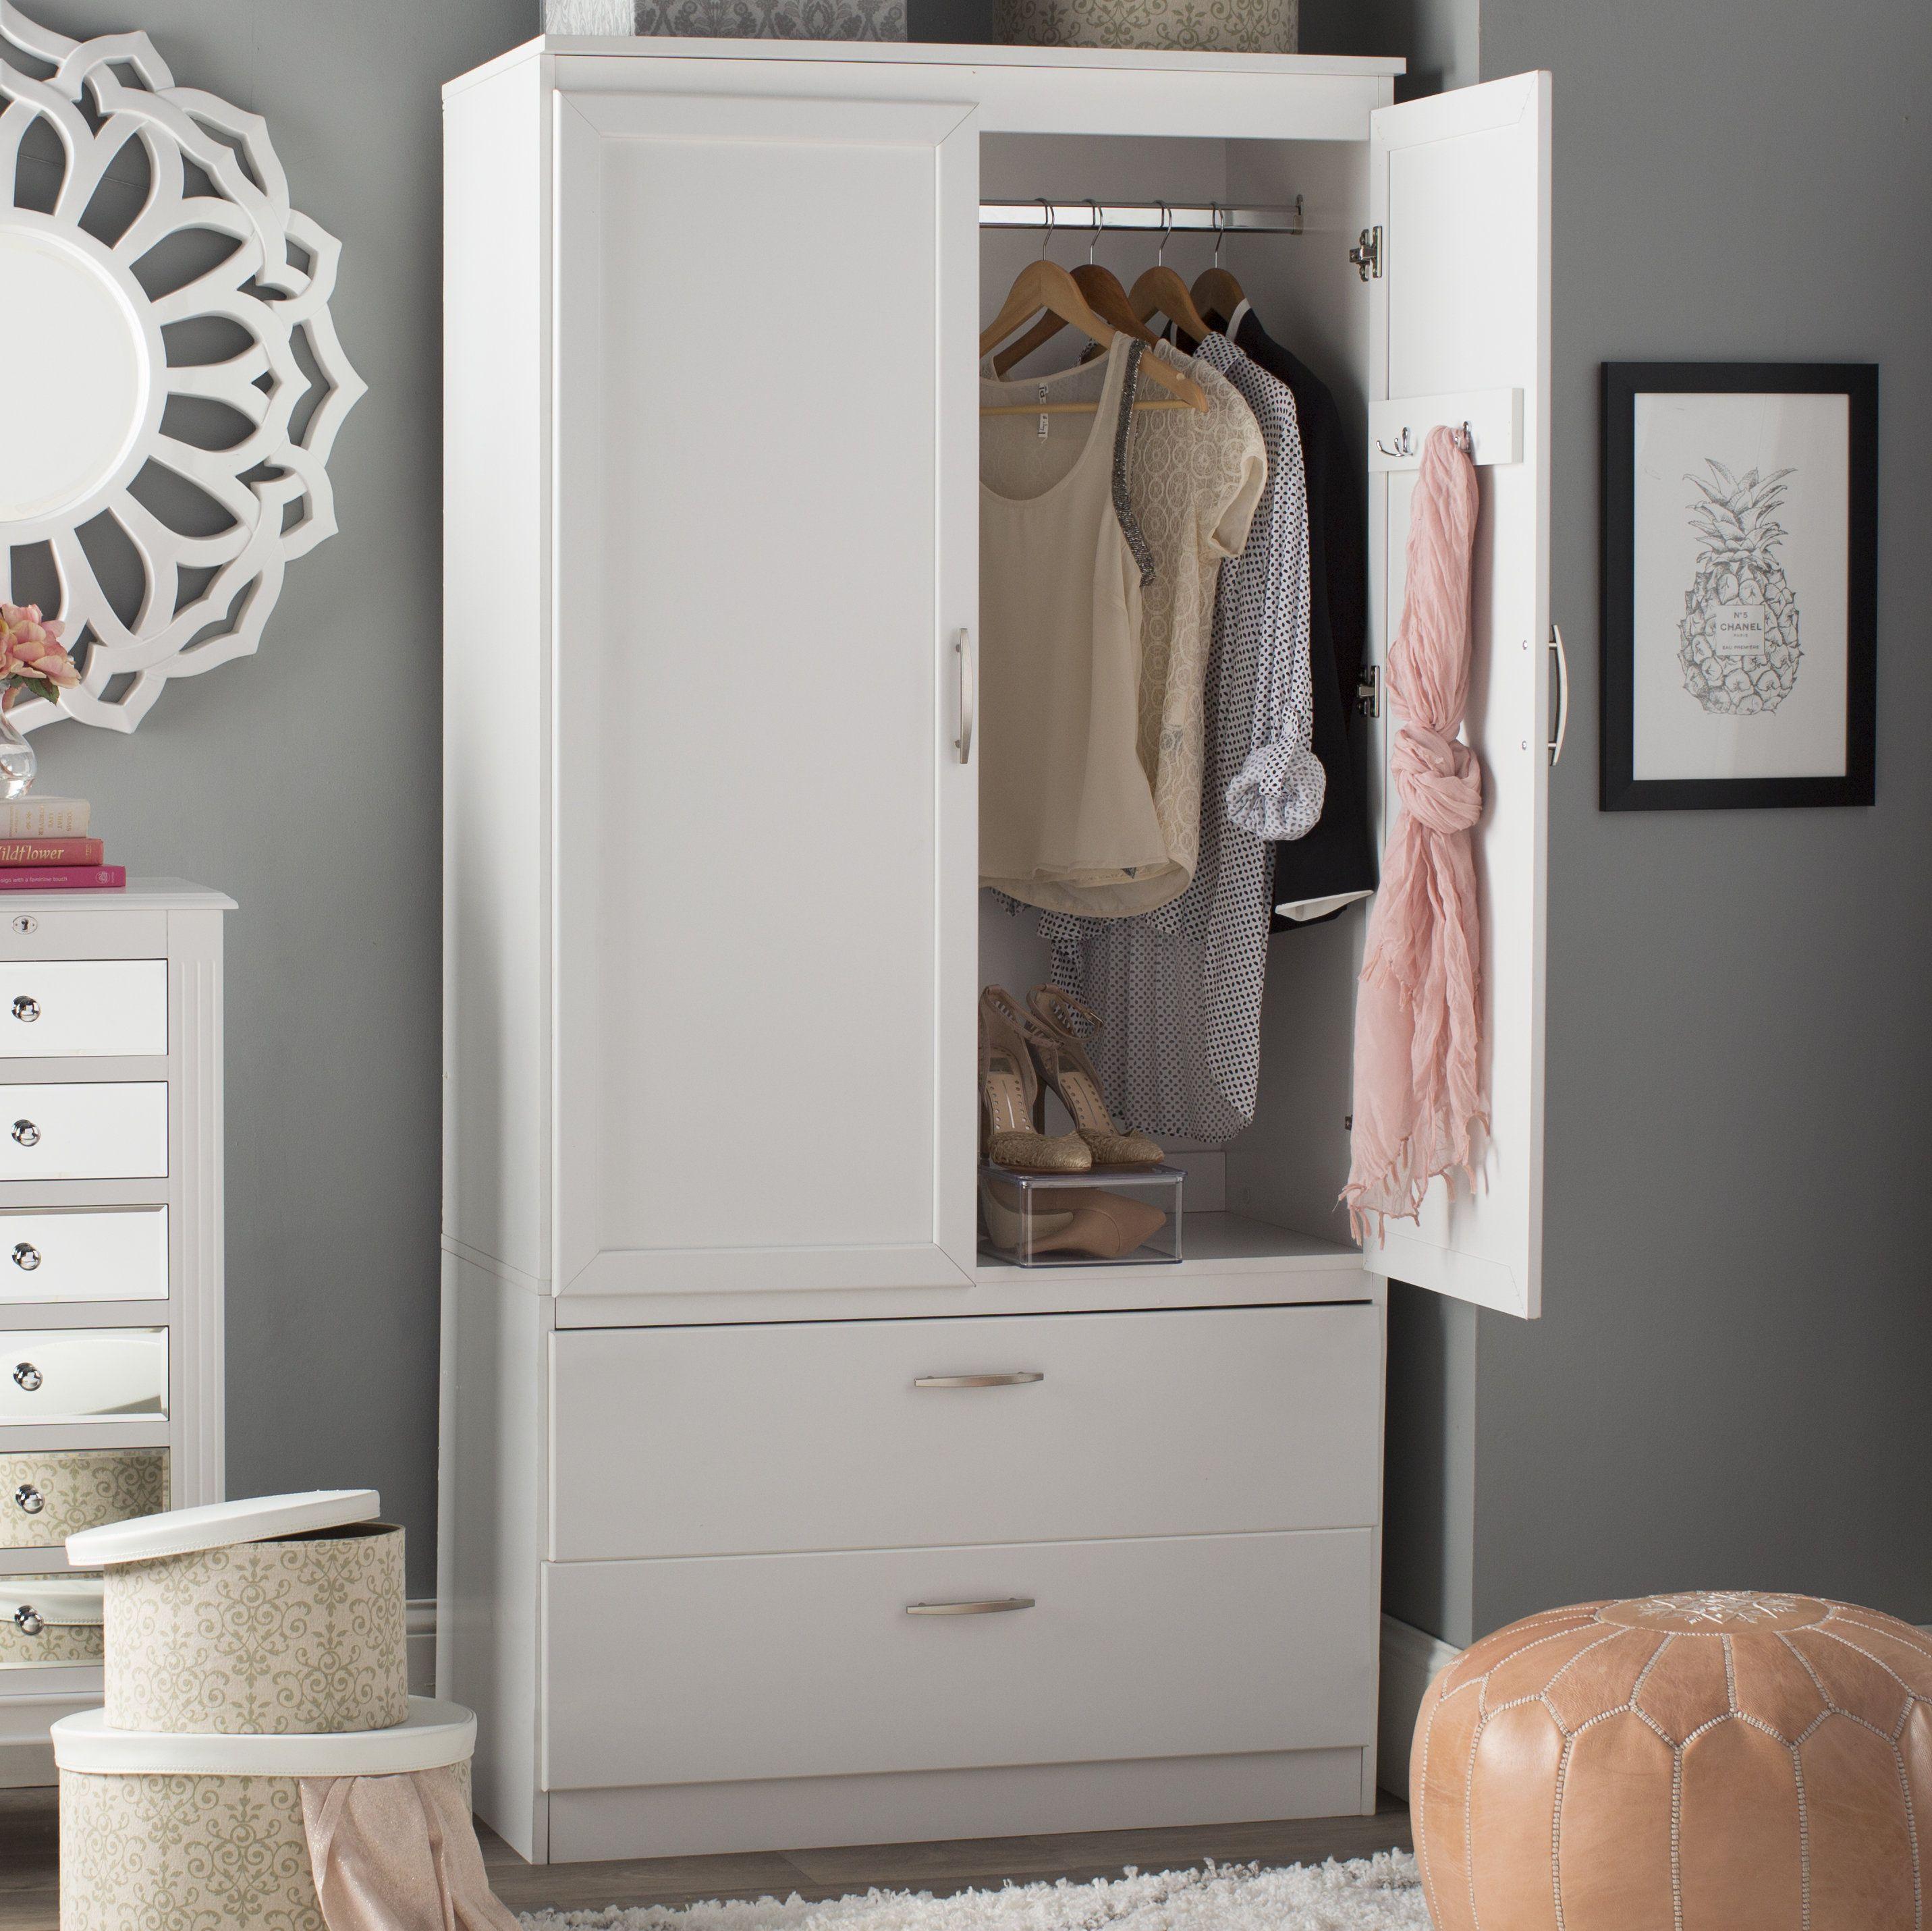 South Shore Wayfair Wardrobe Armoire Furniture Remodel Bedroom Wayfair bedroom wardrobes armoires